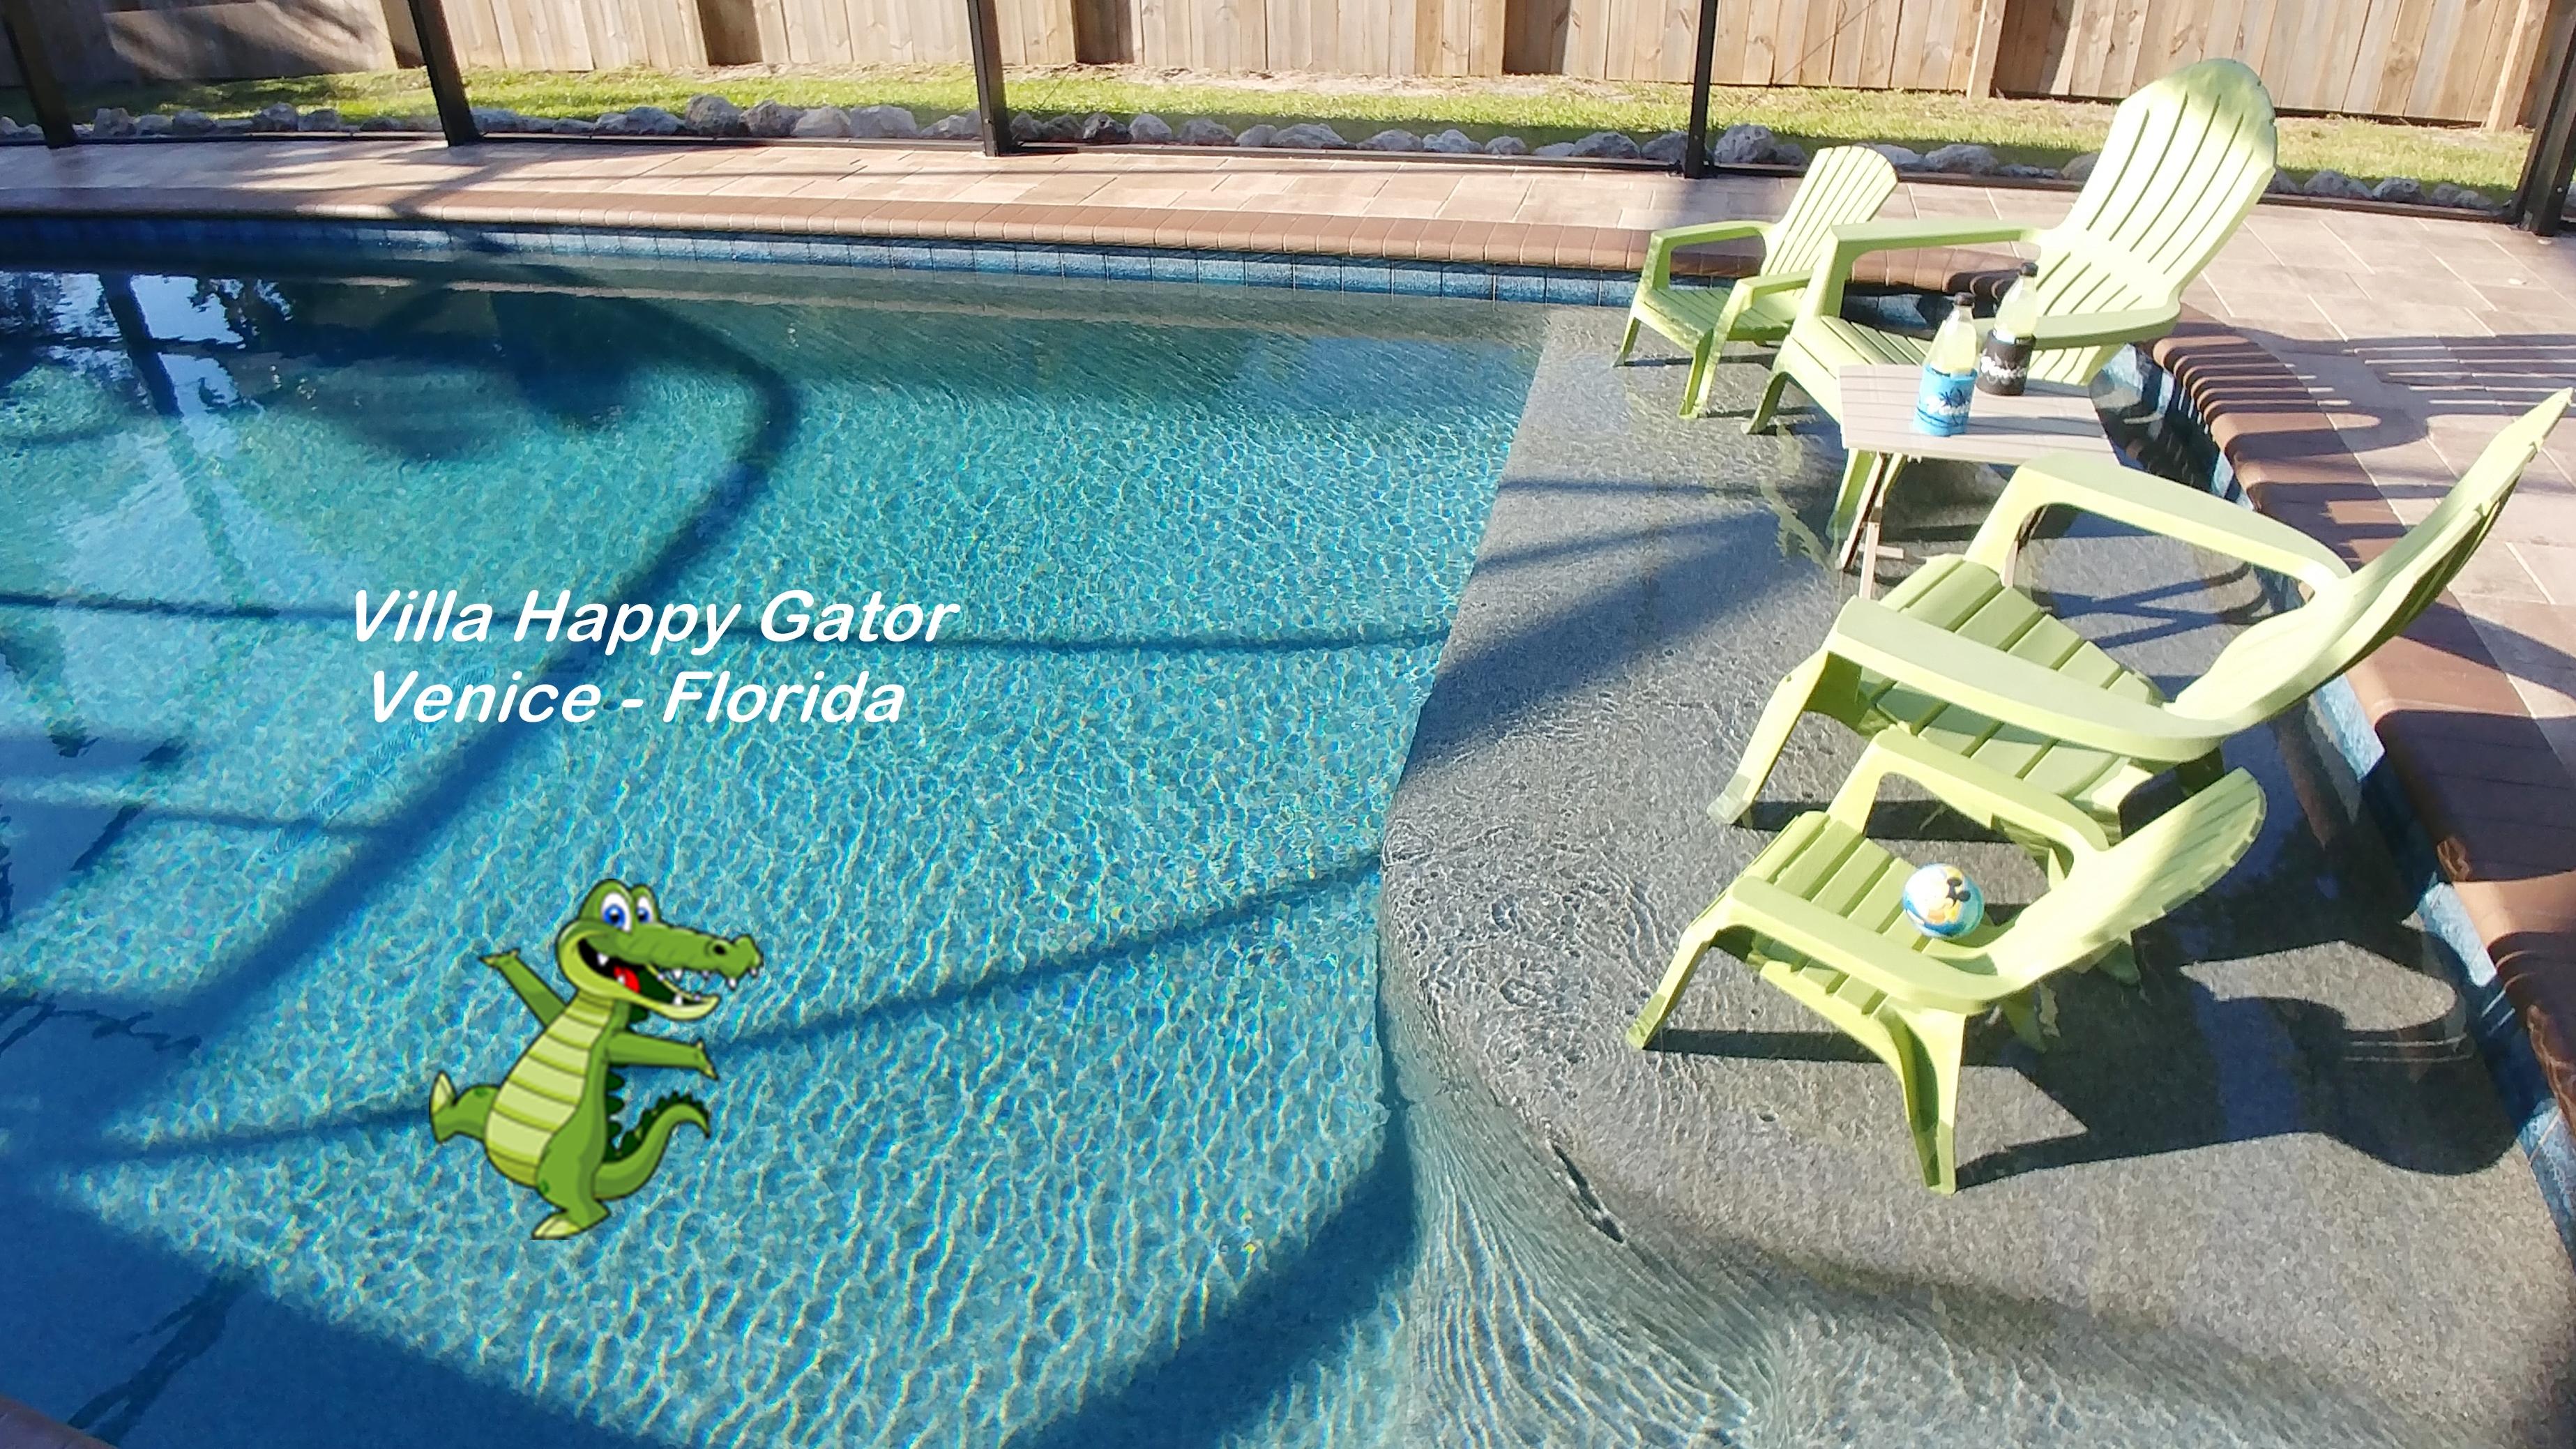 Sunshelf Pool Villa Happy Gator